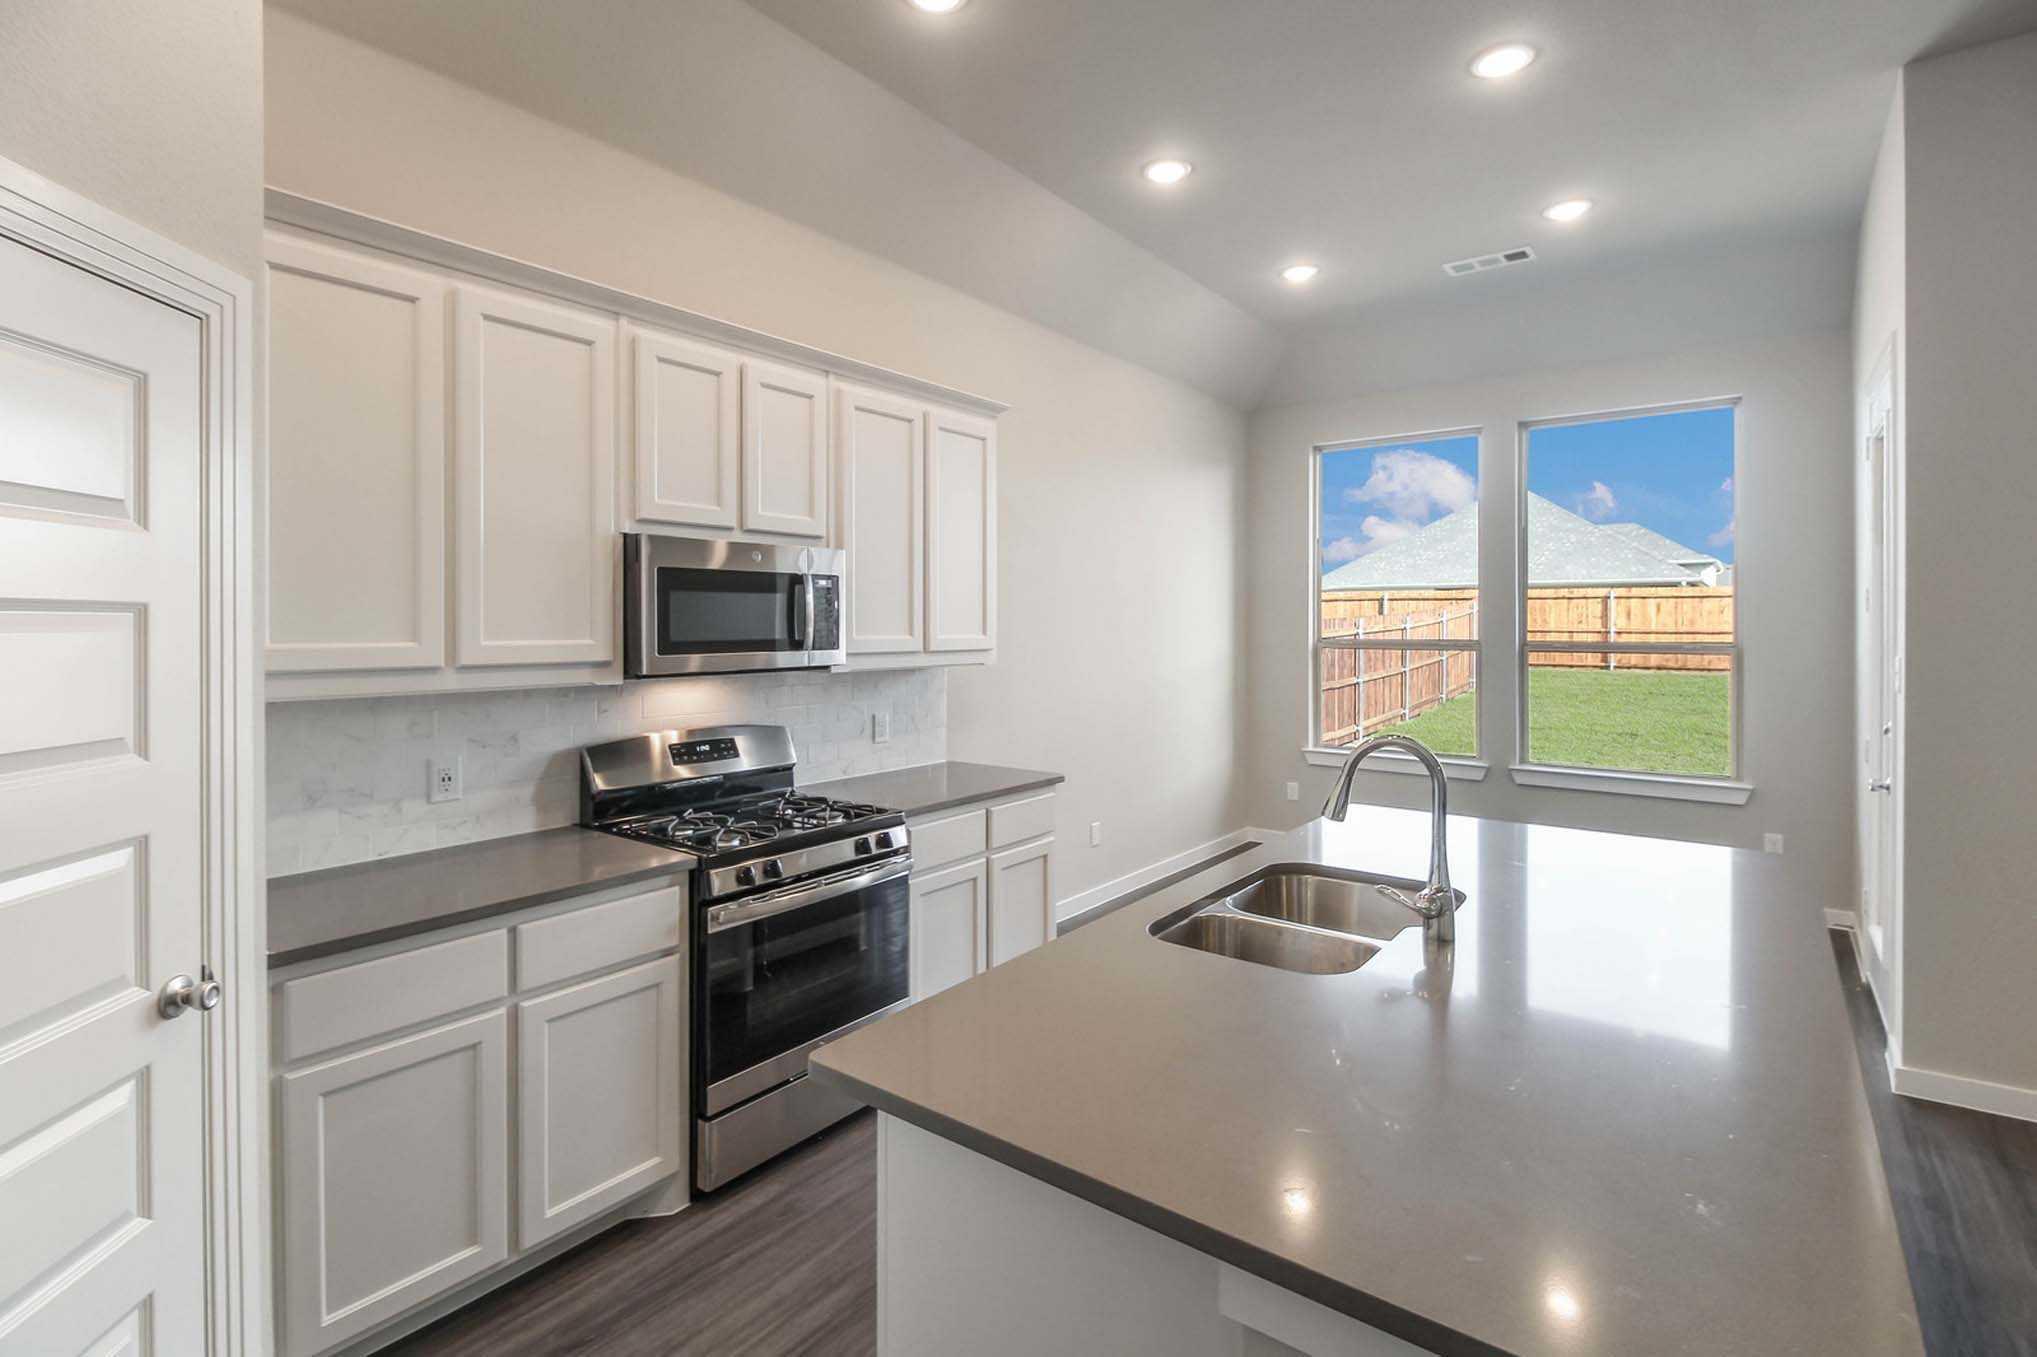 Kitchen featured in the Plan Camden By Highland Homes in San Antonio, TX